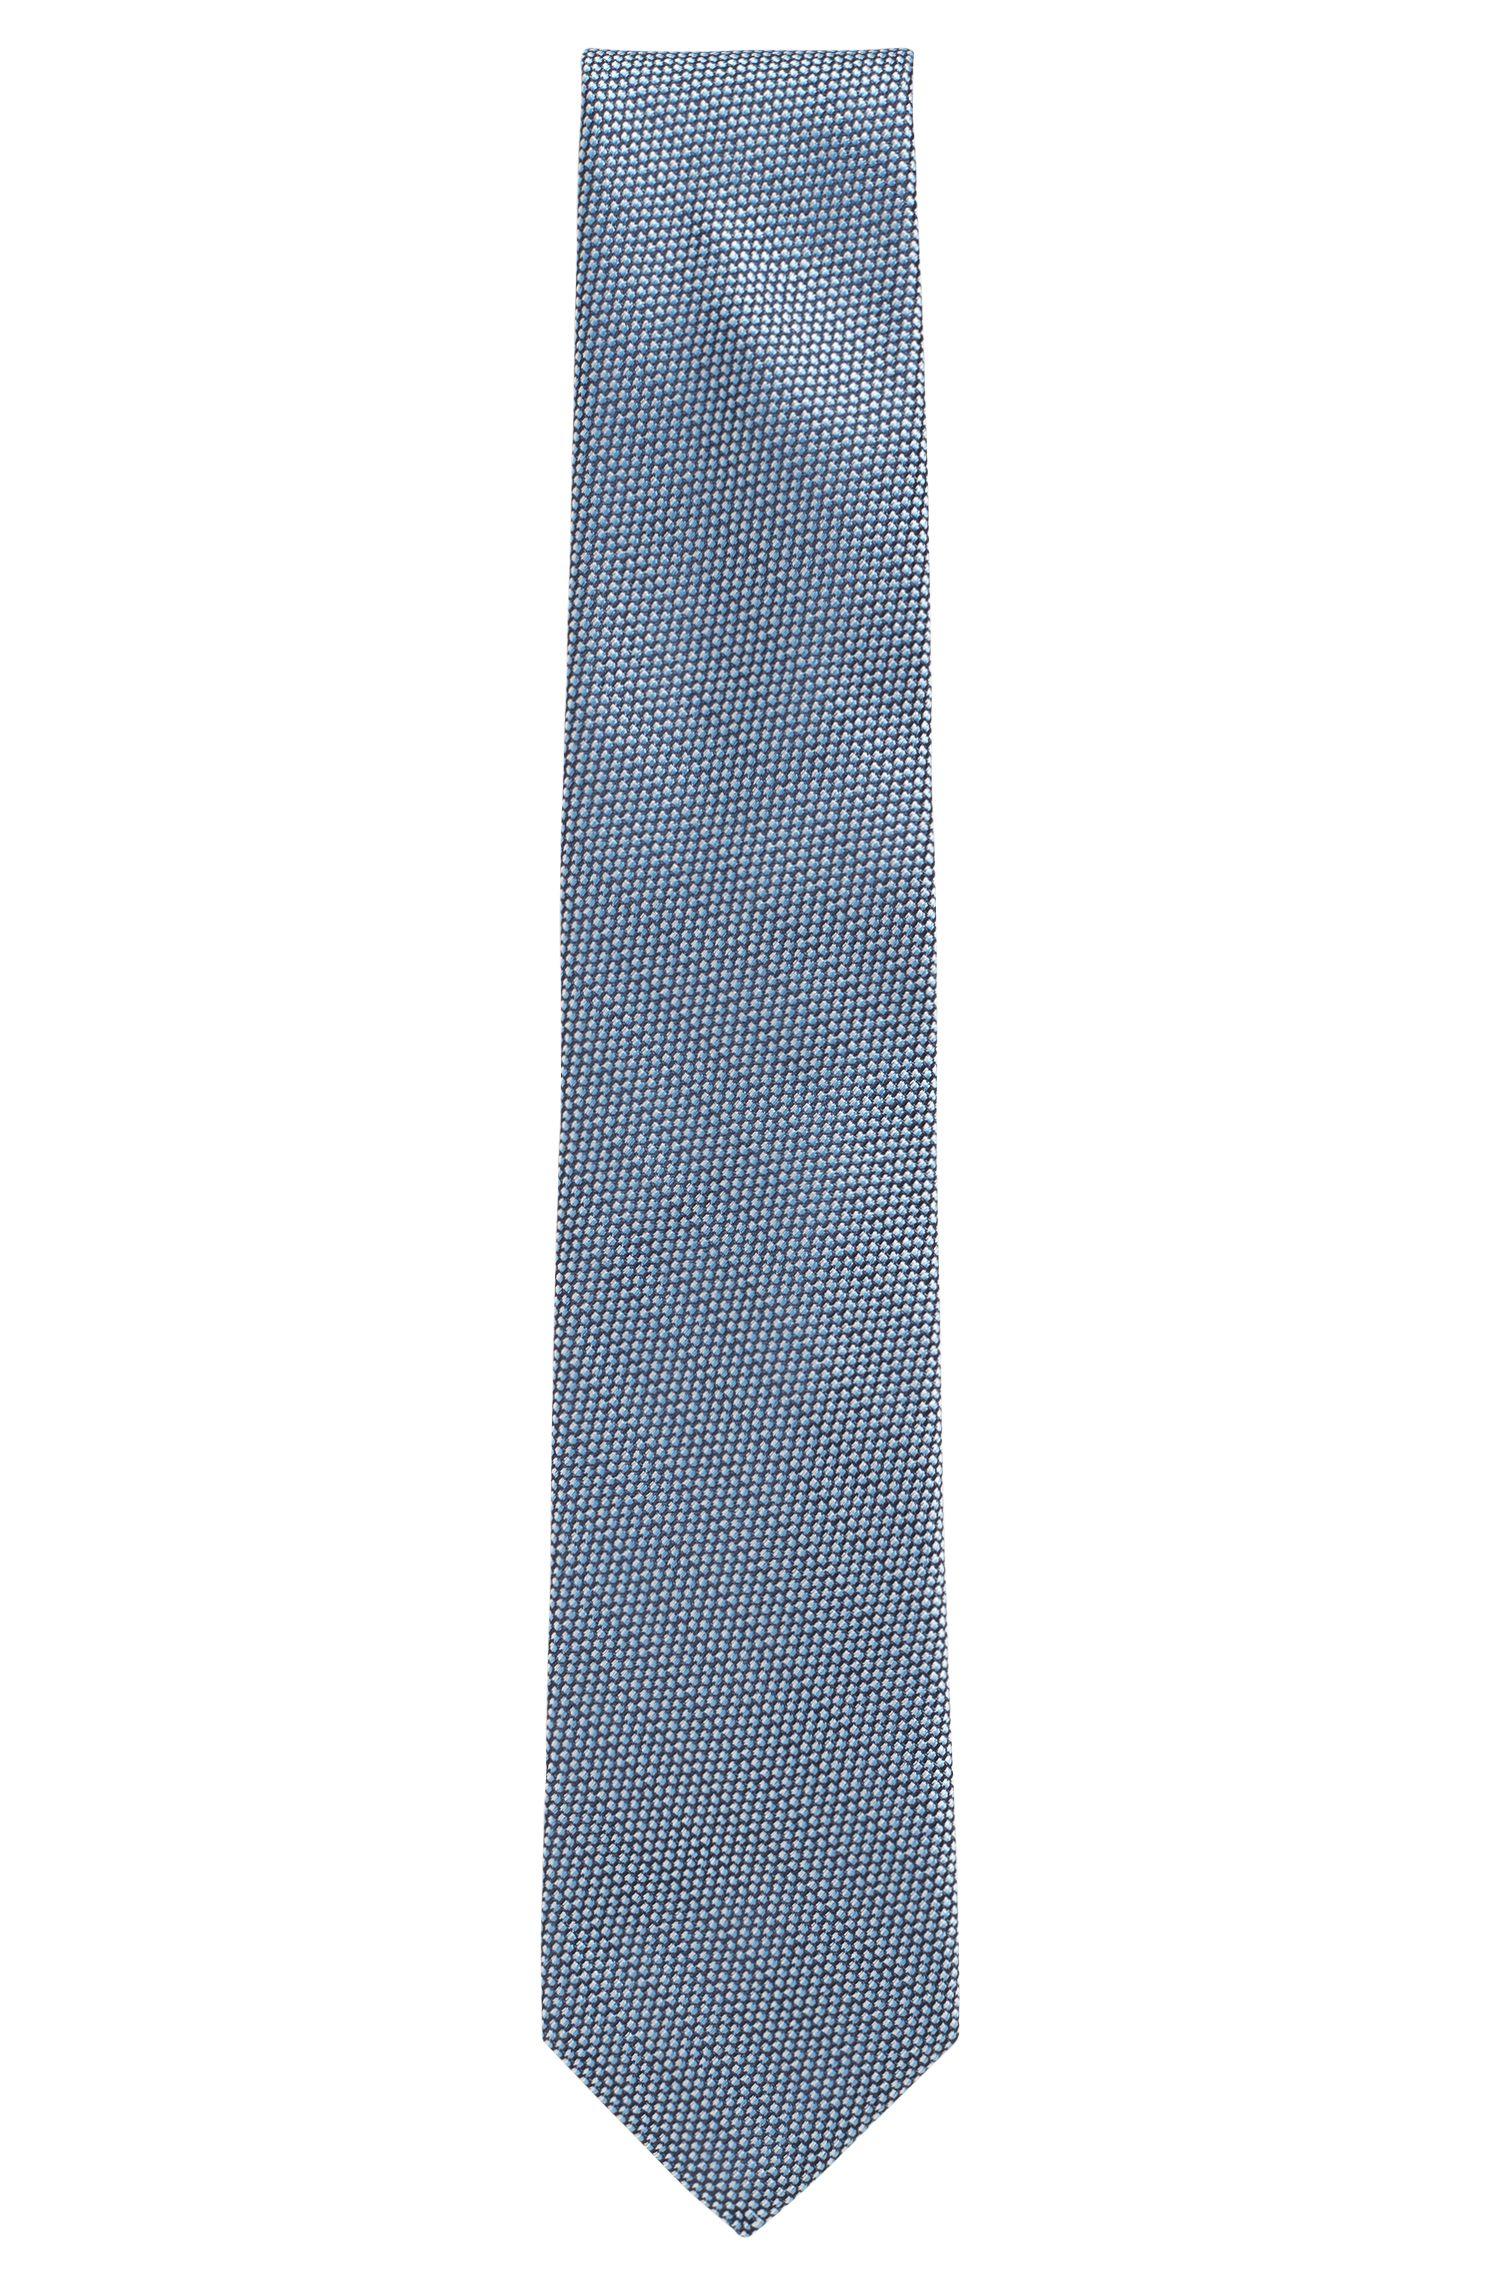 Seidenkrawatte mit filigranem Muster, Hellblau